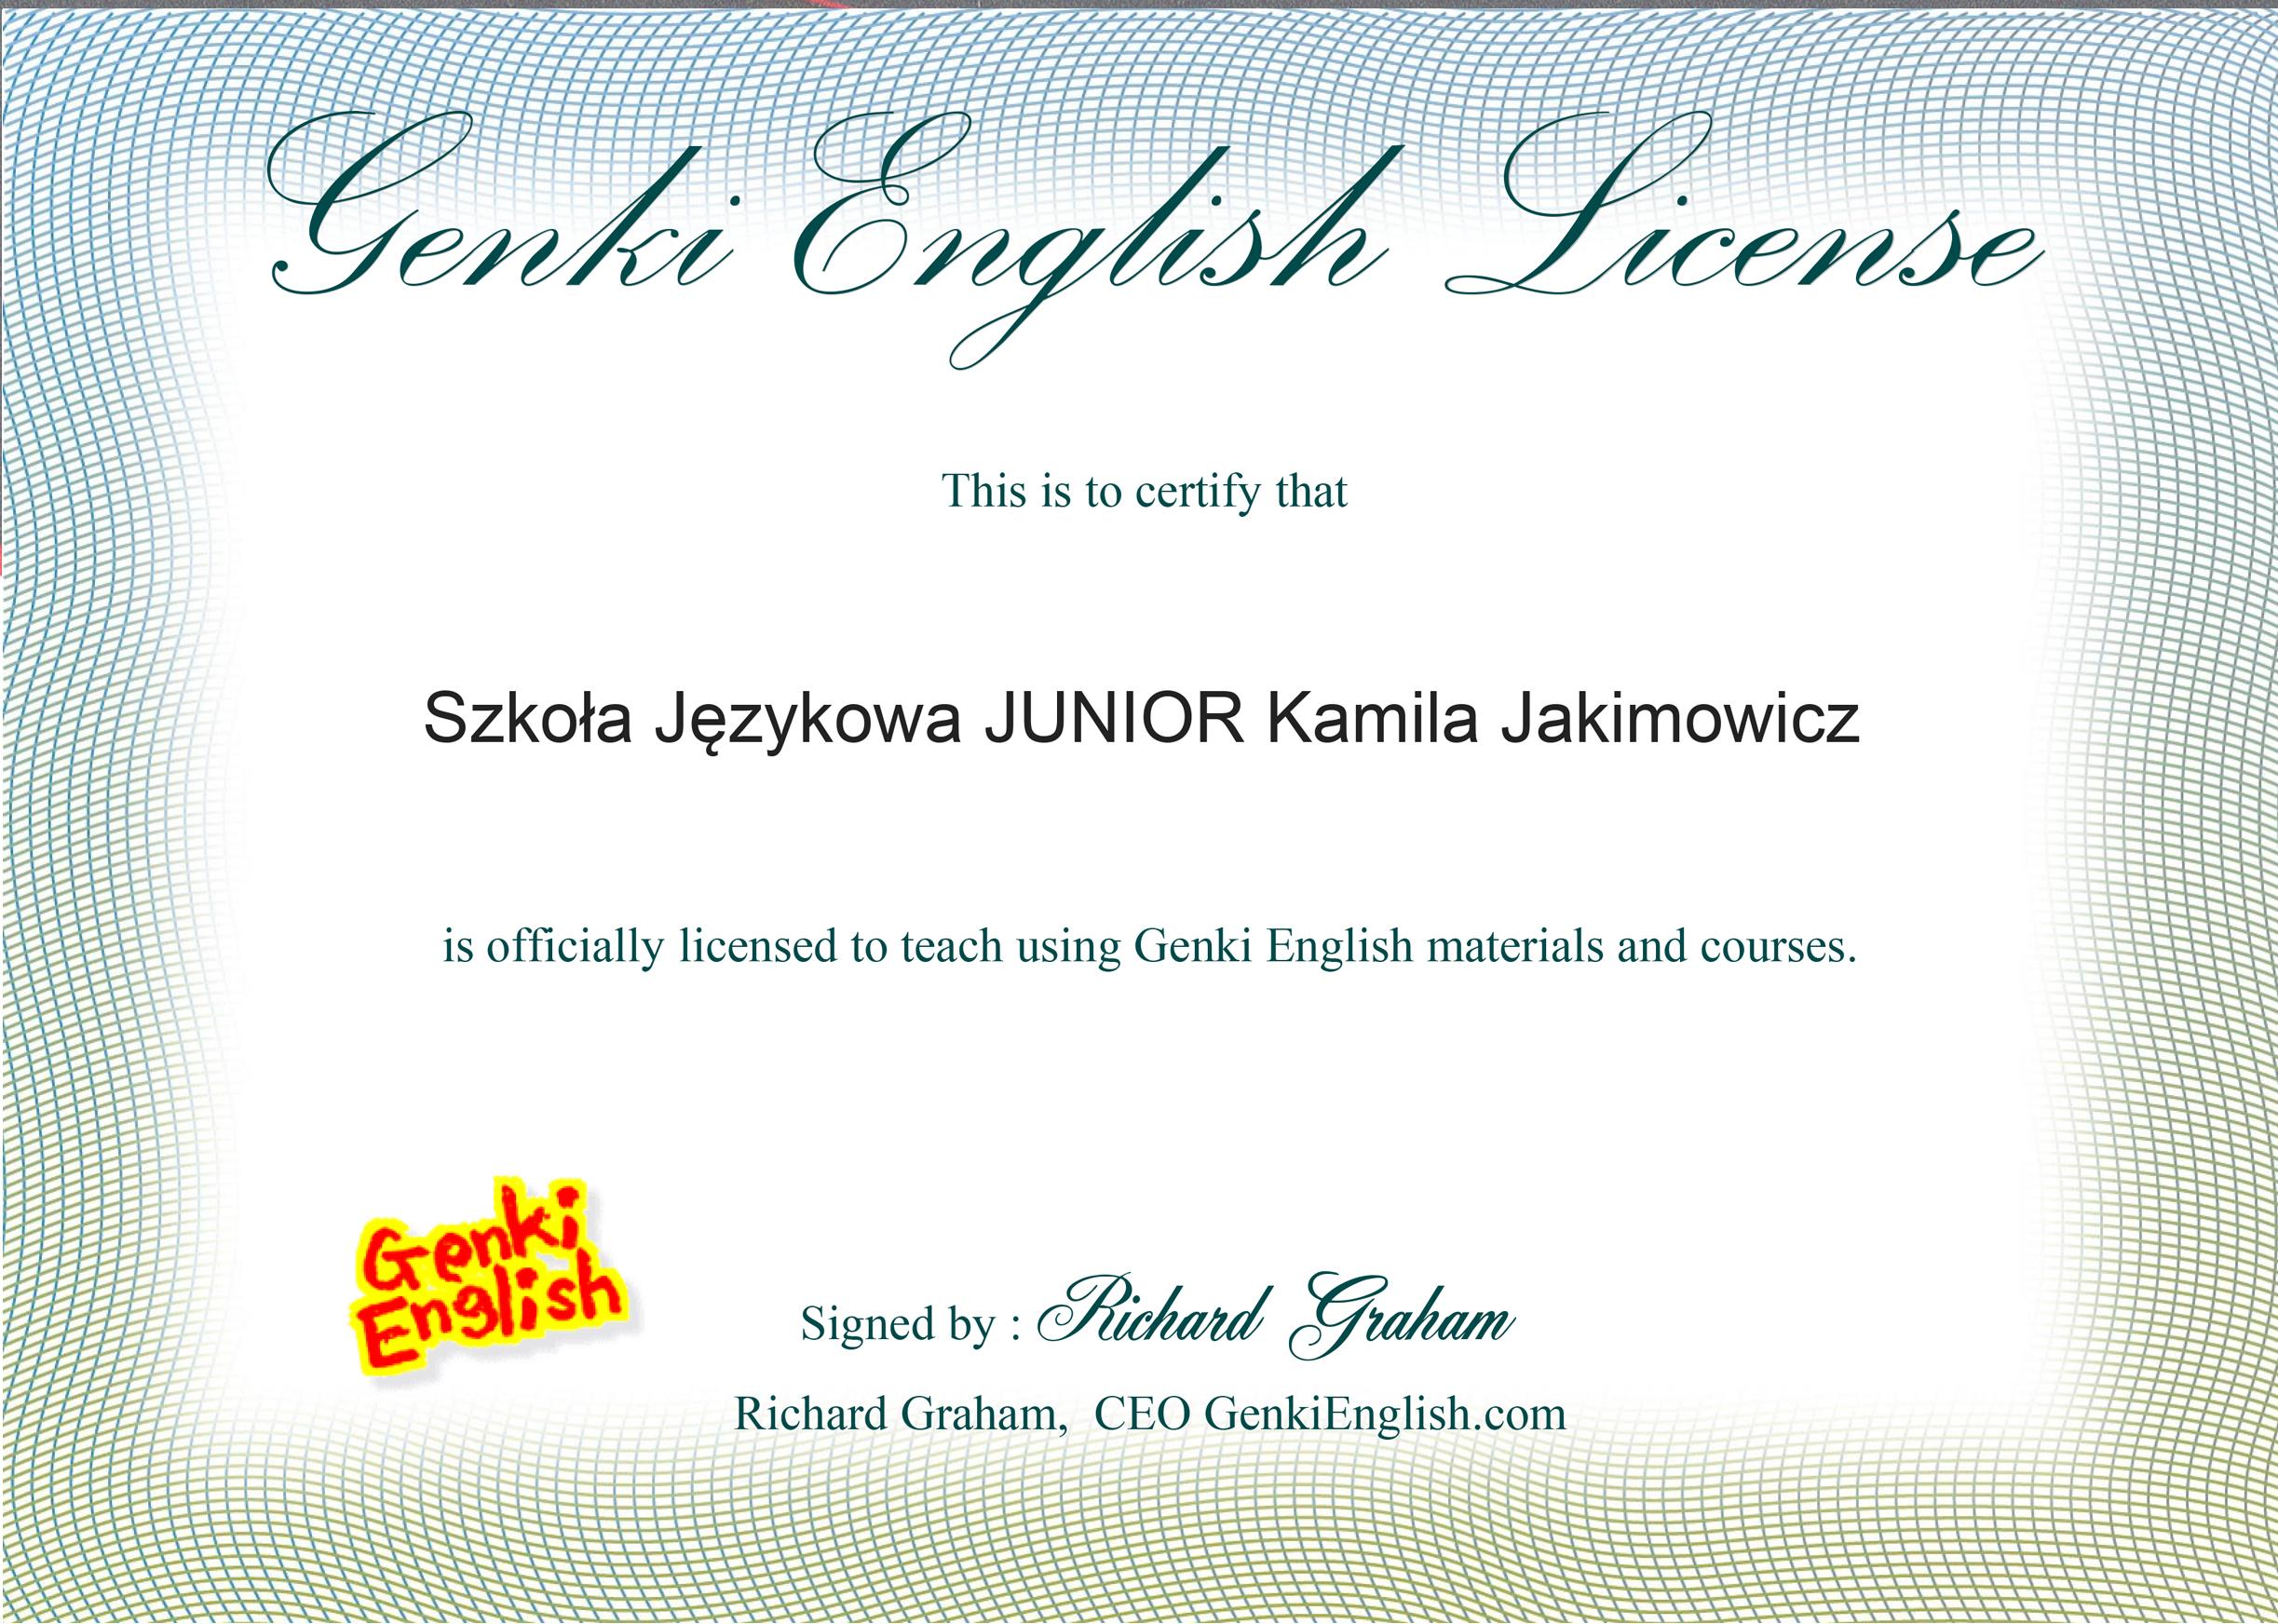 genki-english-licence-akademia-junior